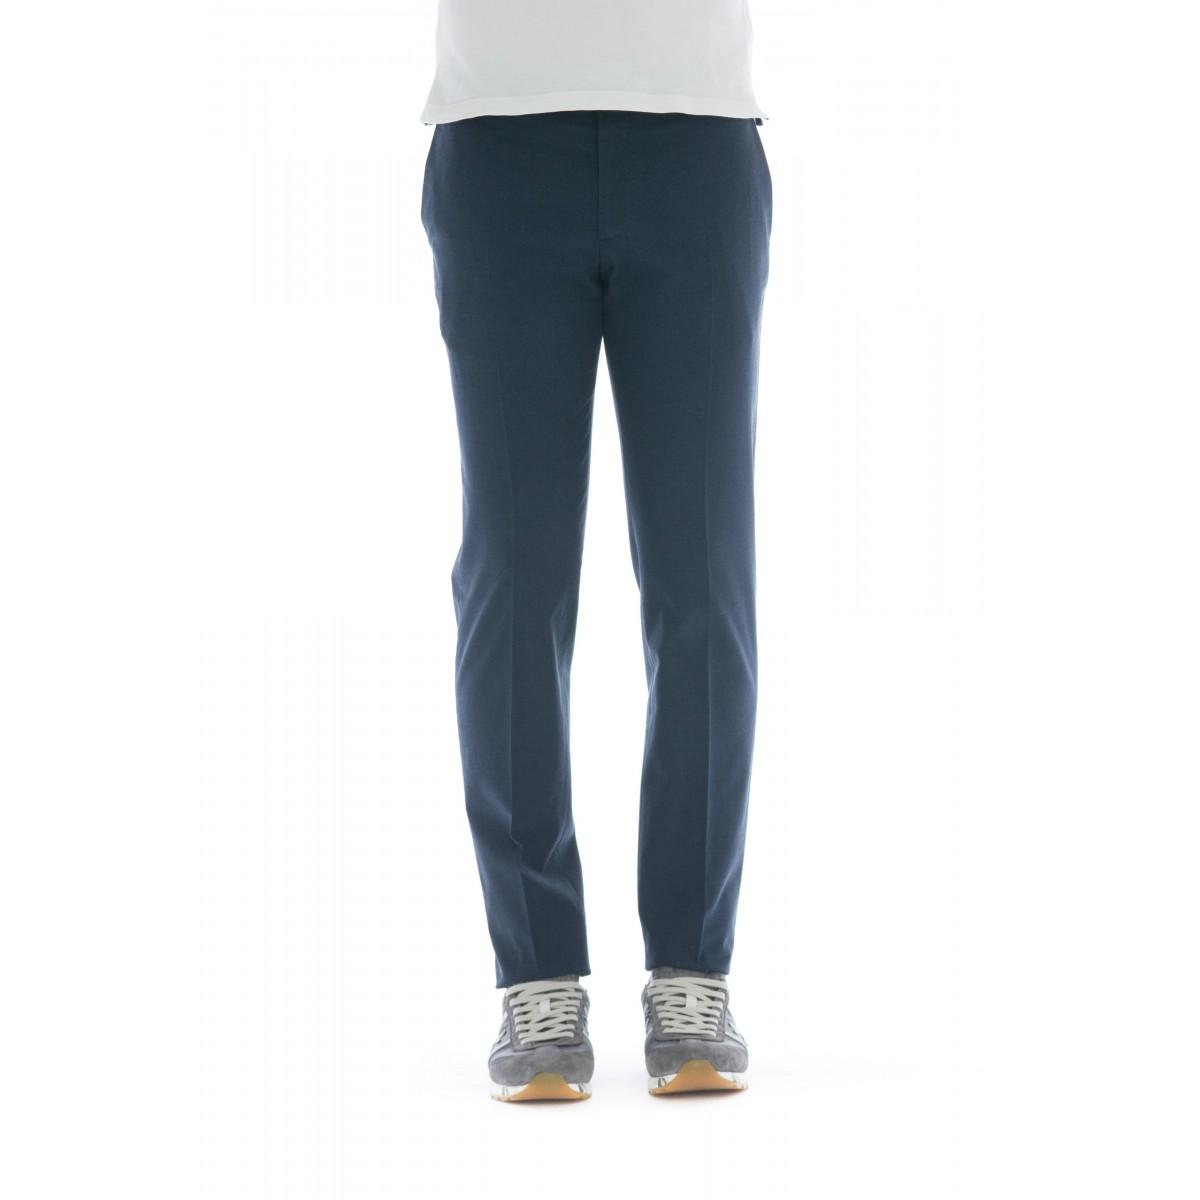 Pantalone uomo - 1gwt30 9223g ice cotton pantalone